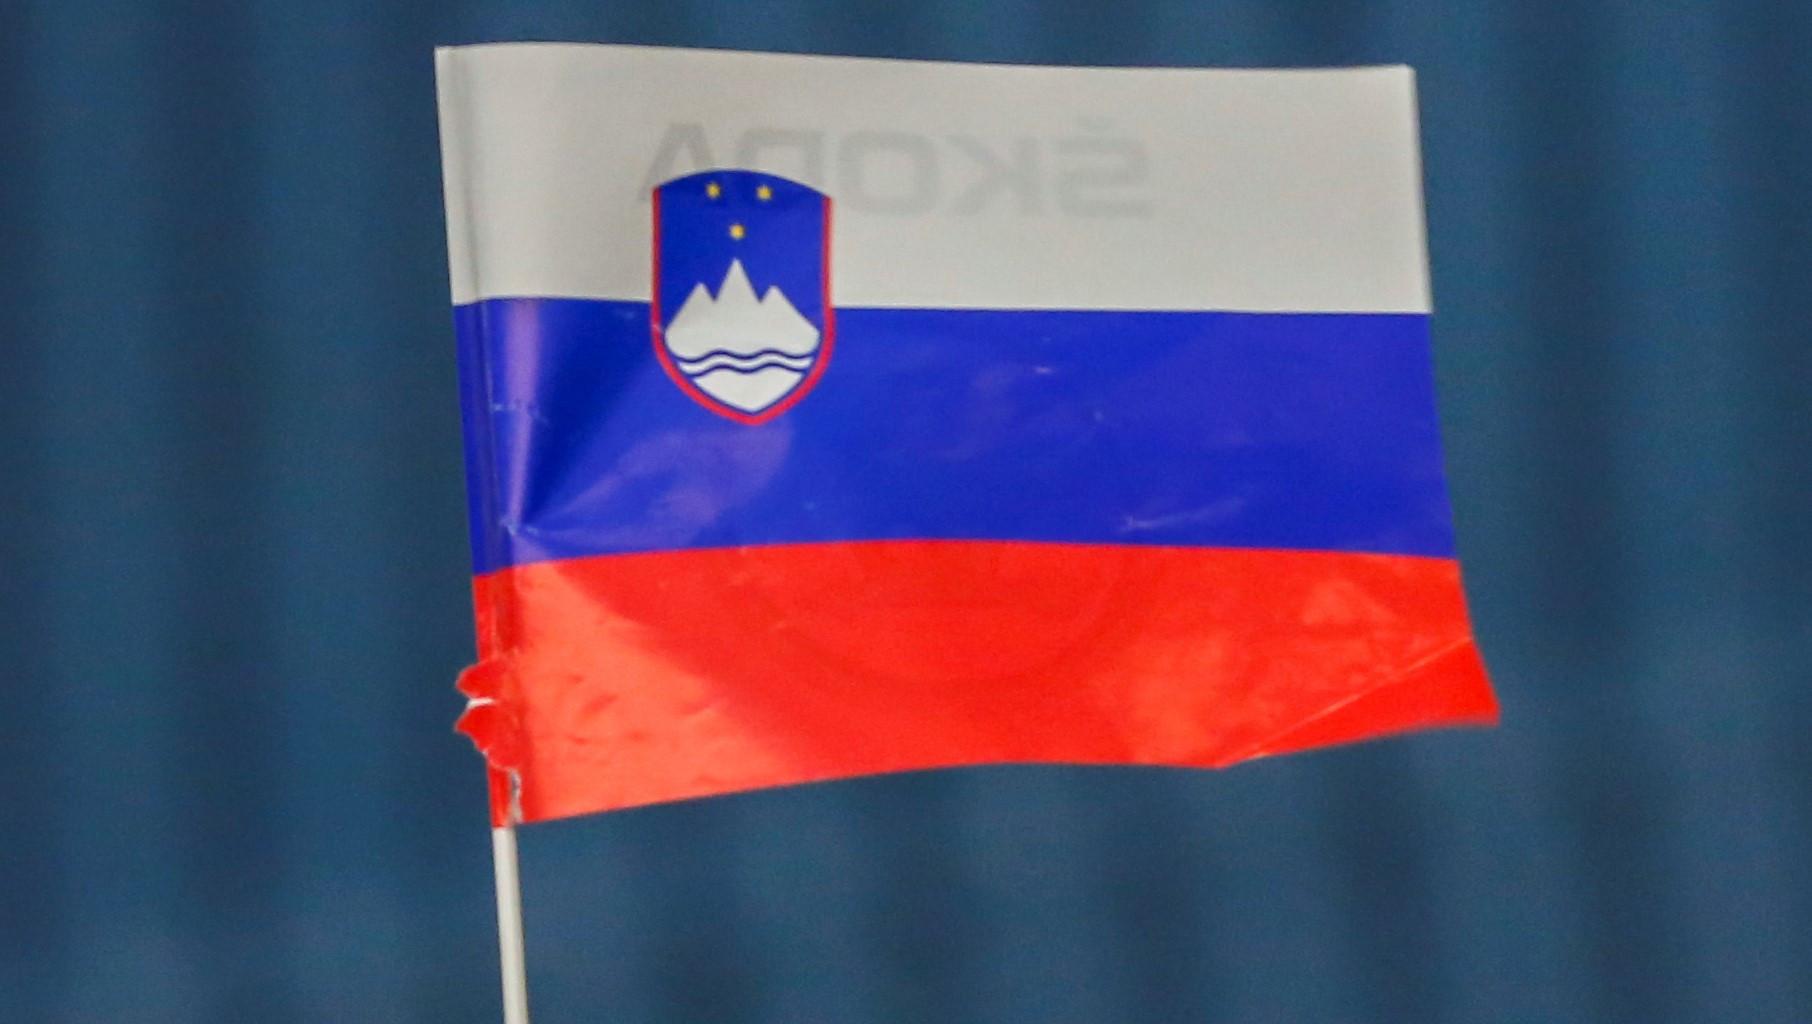 Ex-Ice Hockey Federation of Slovenia President Aljancic dies aged 77